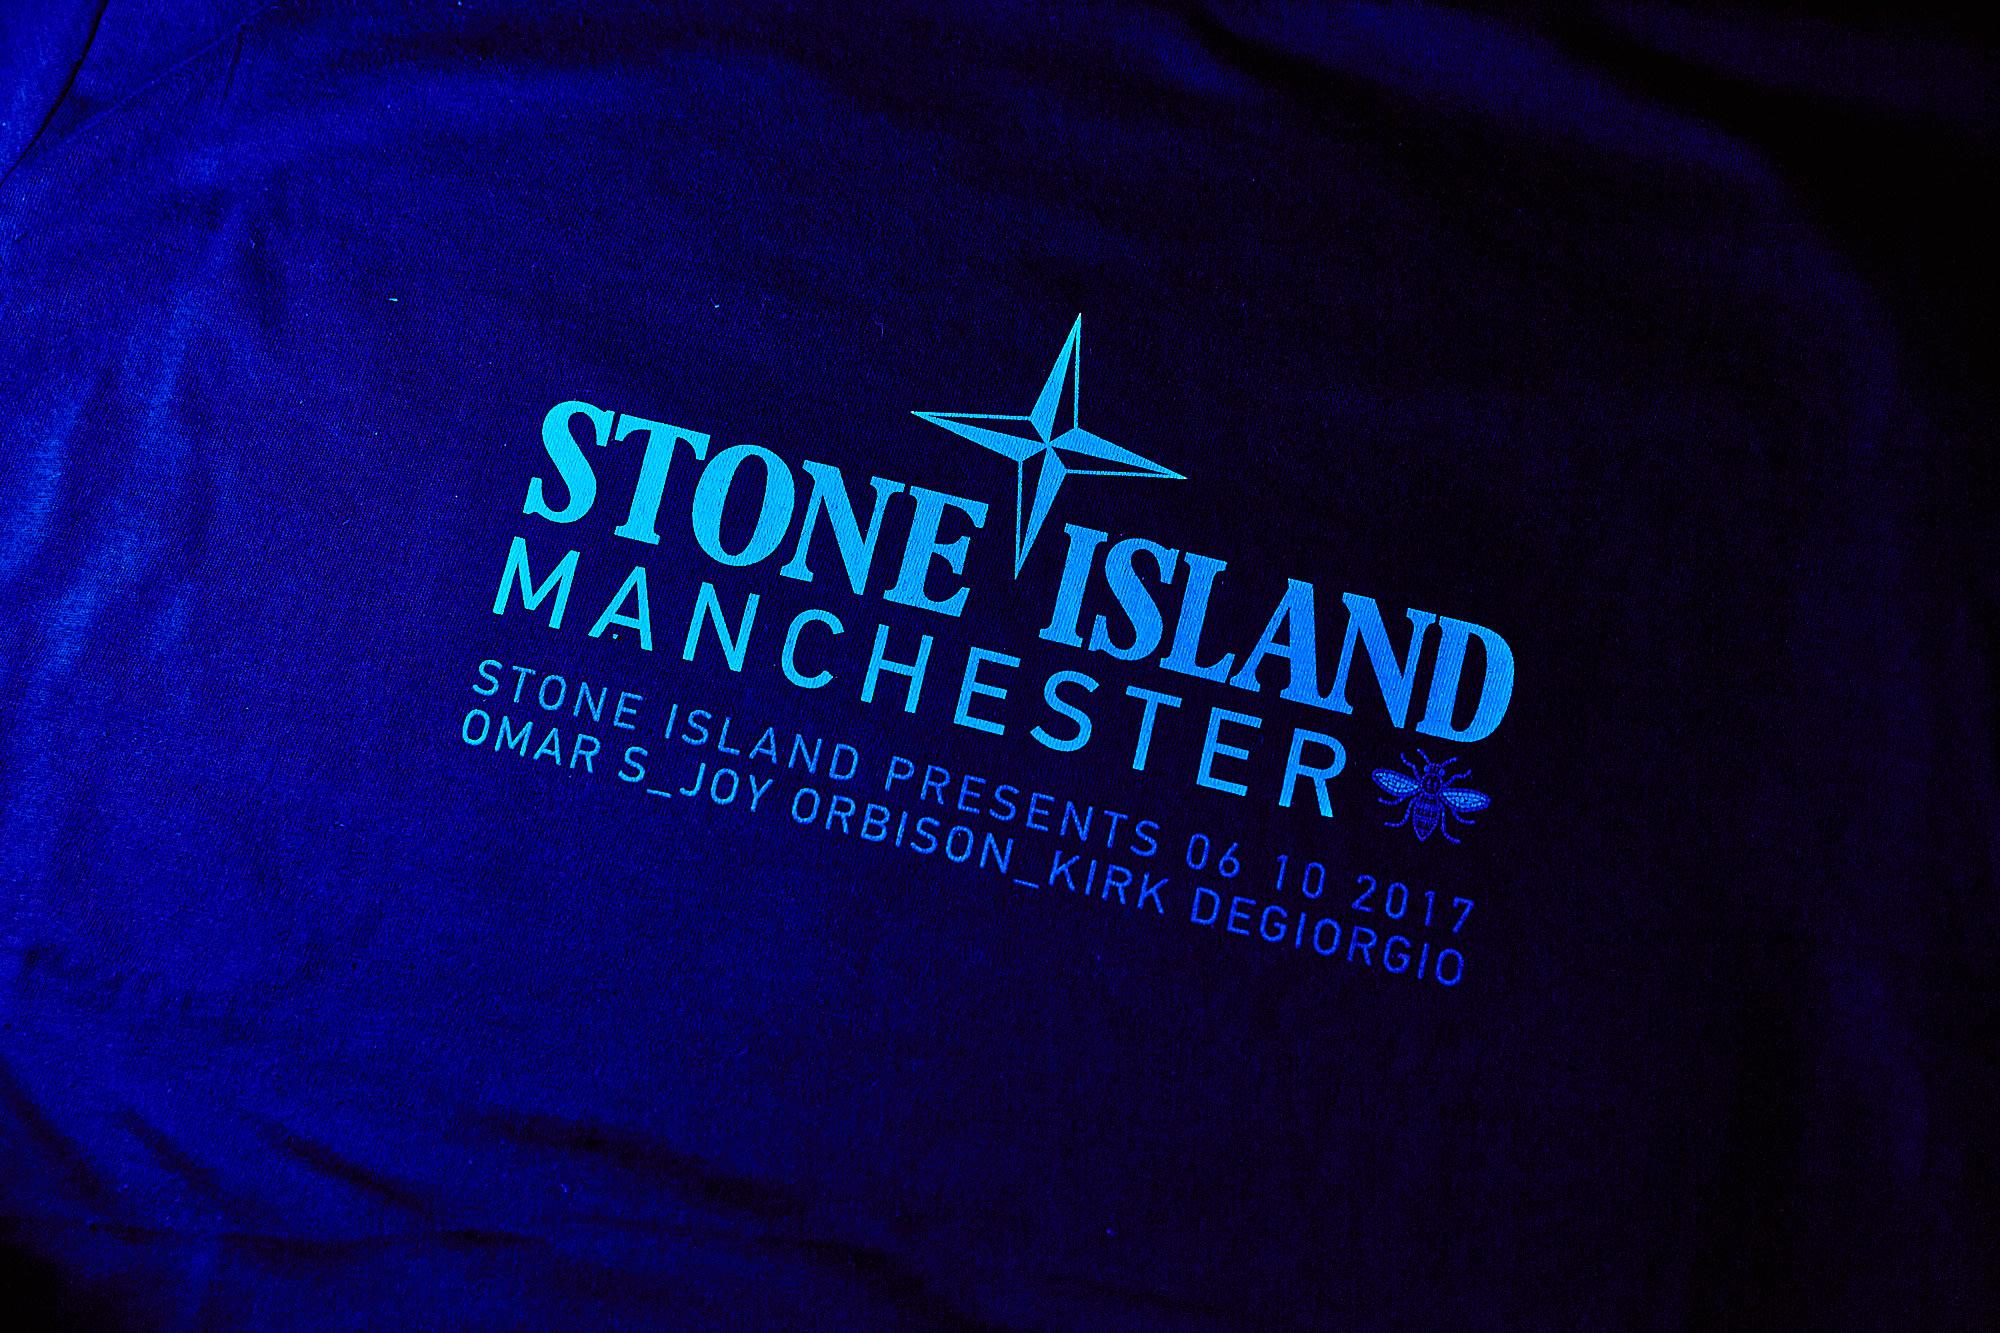 stoneisland-manchester-4